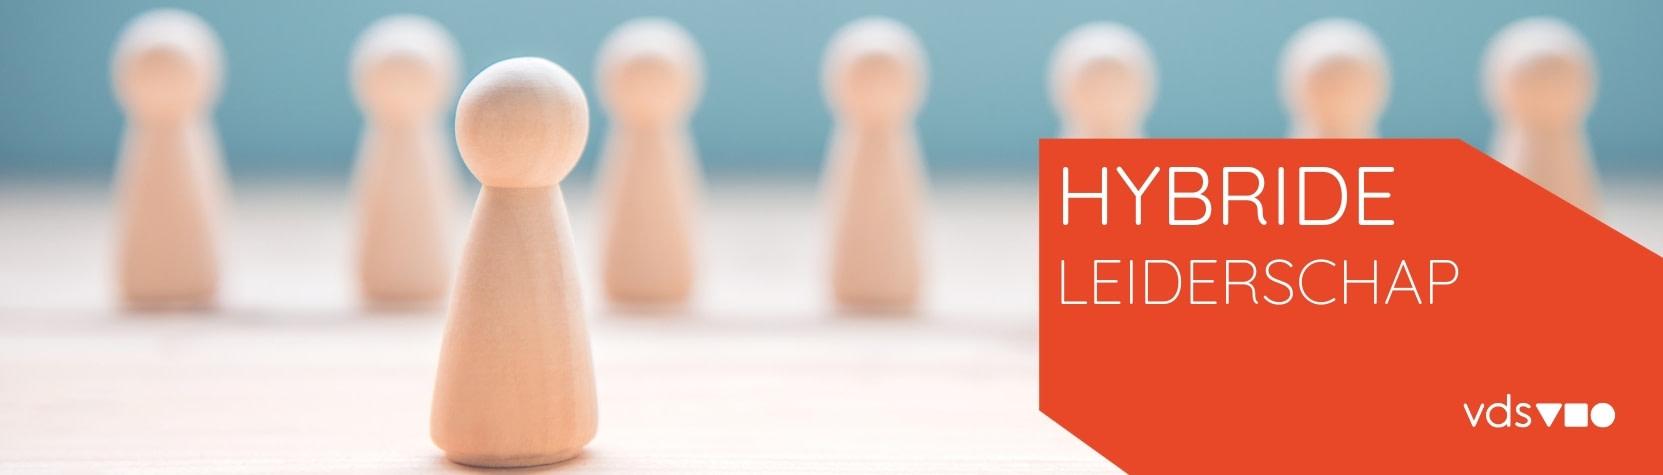 Vds training consultants programma hybride leiderschap